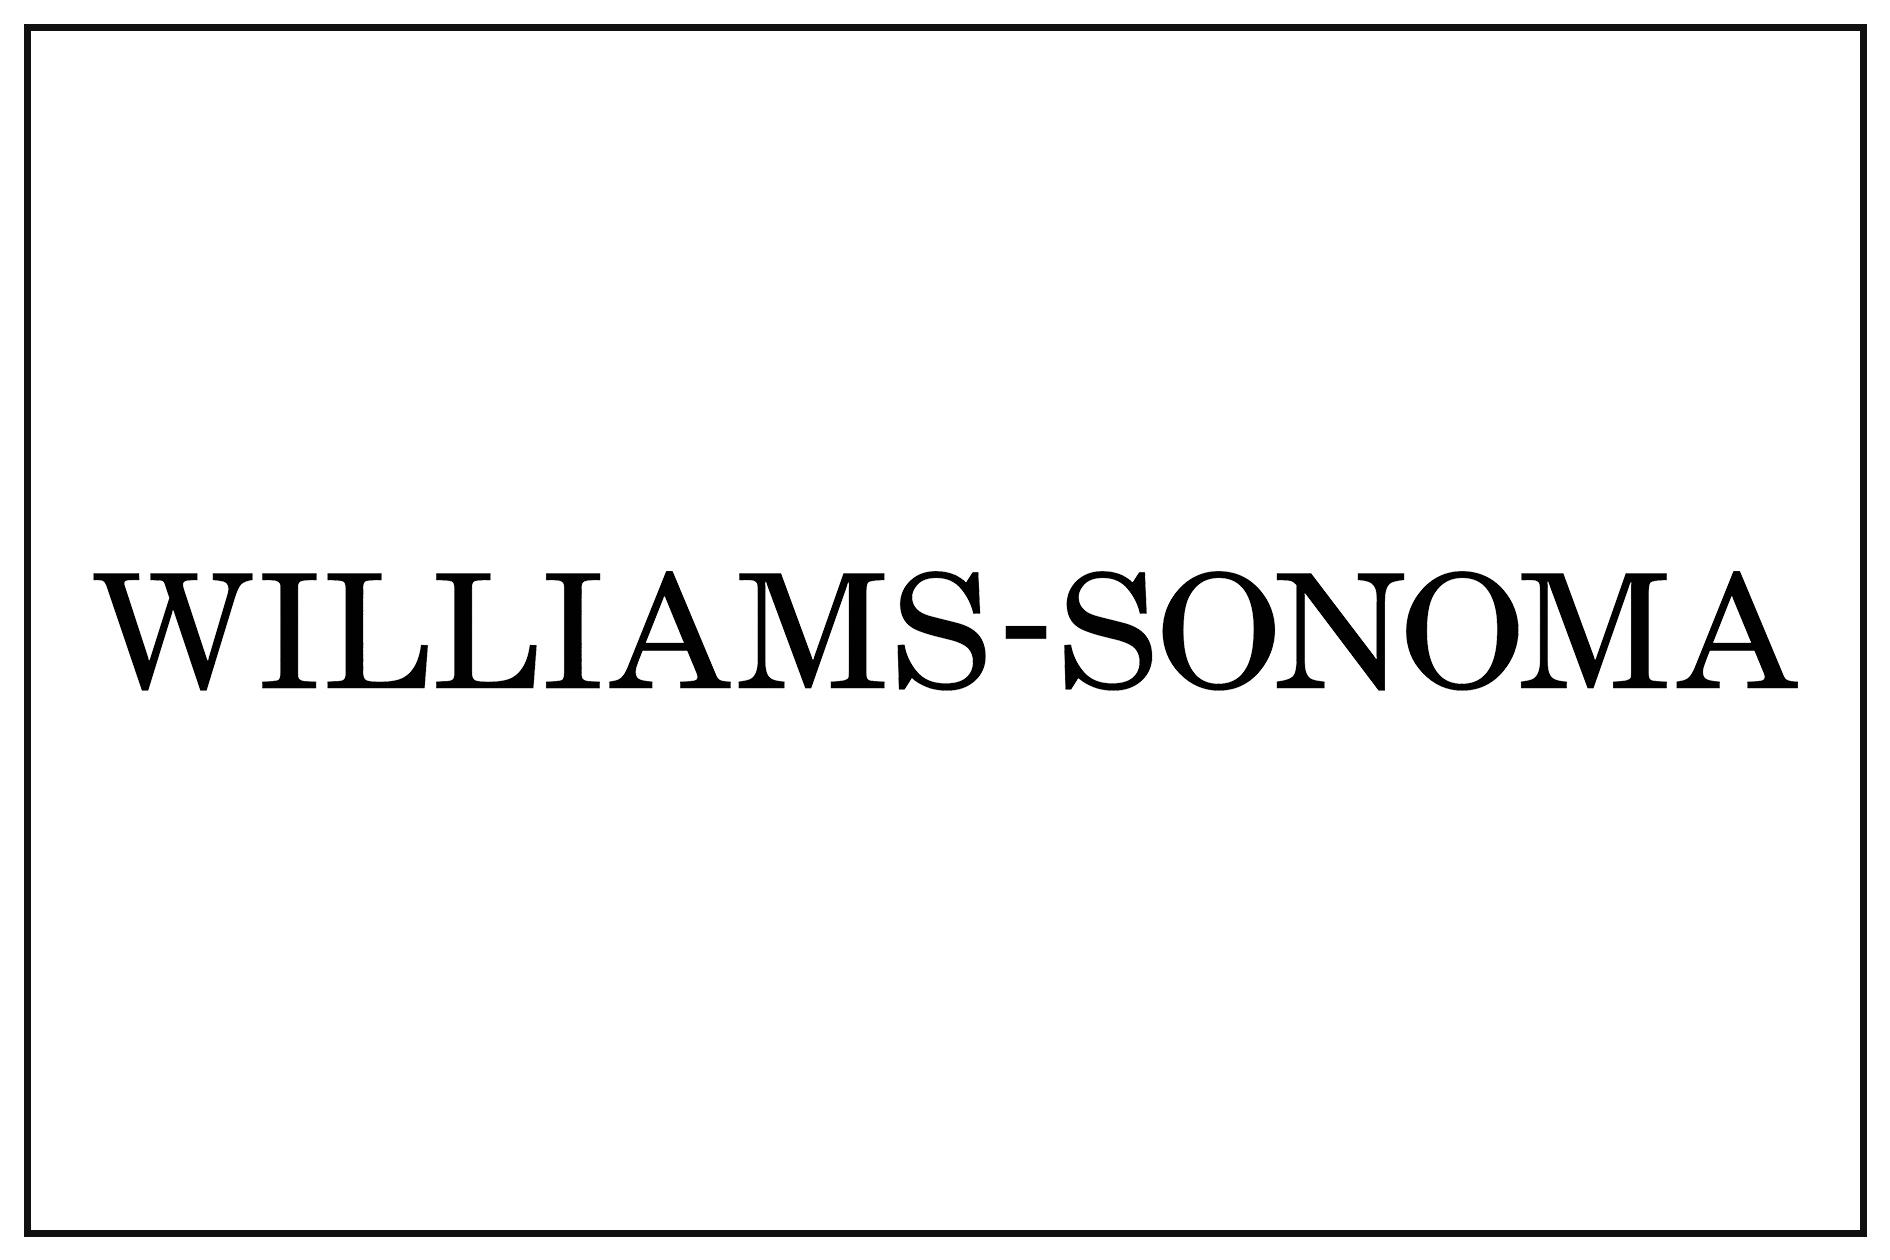 jason-b-graham-collaborations-williams-sonoma-2018.12.13